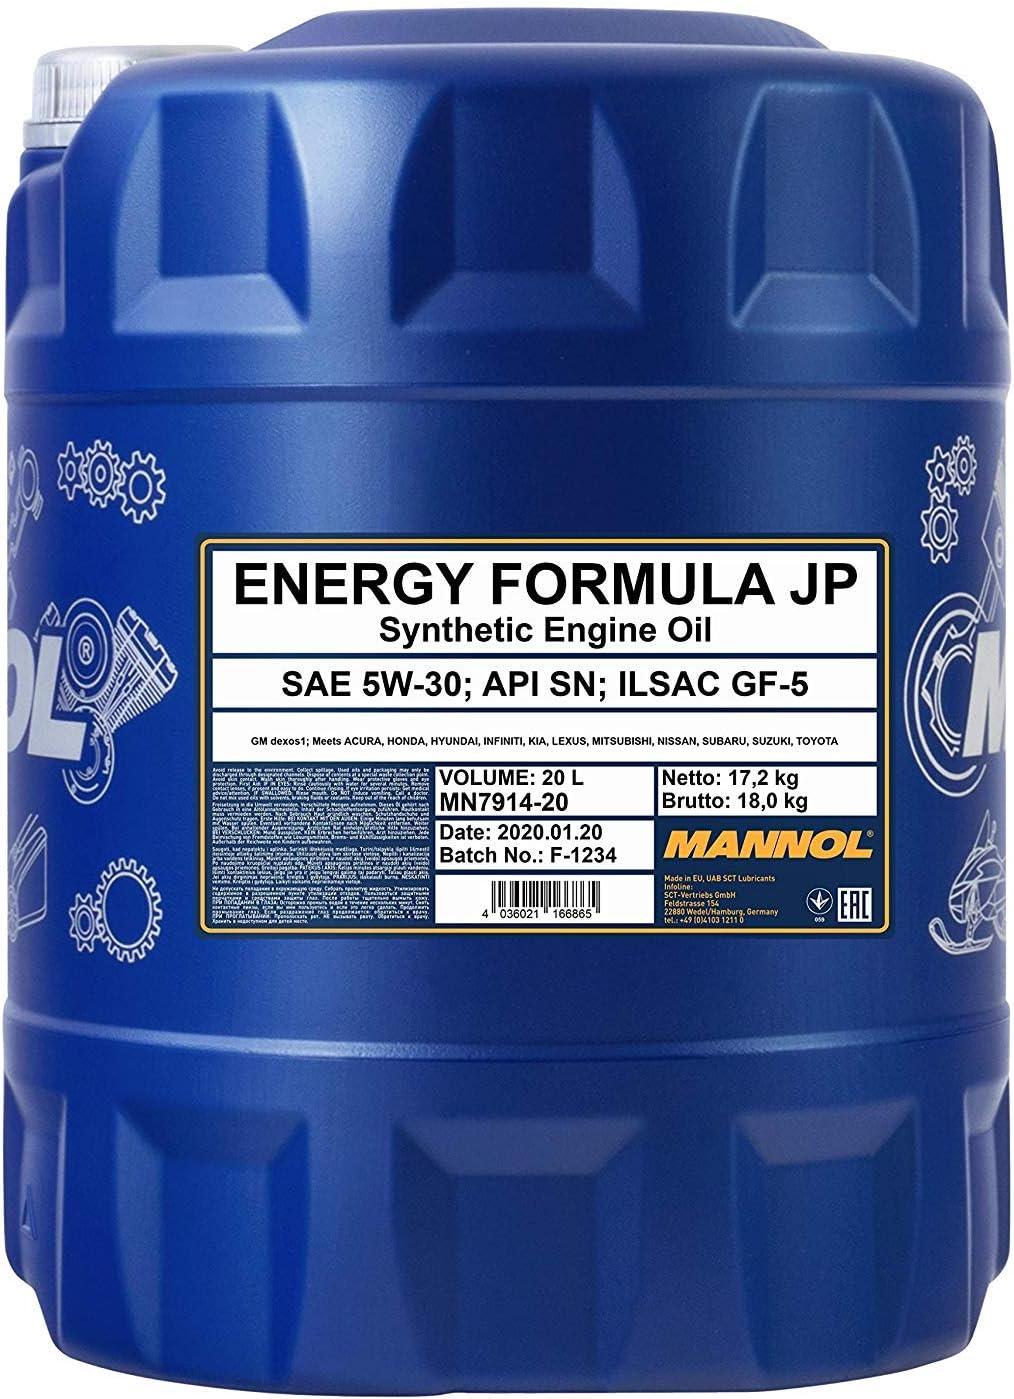 Mannol Energy Formula Jp 5w 30 Api Sn Motorenöl 20 Liter Auto